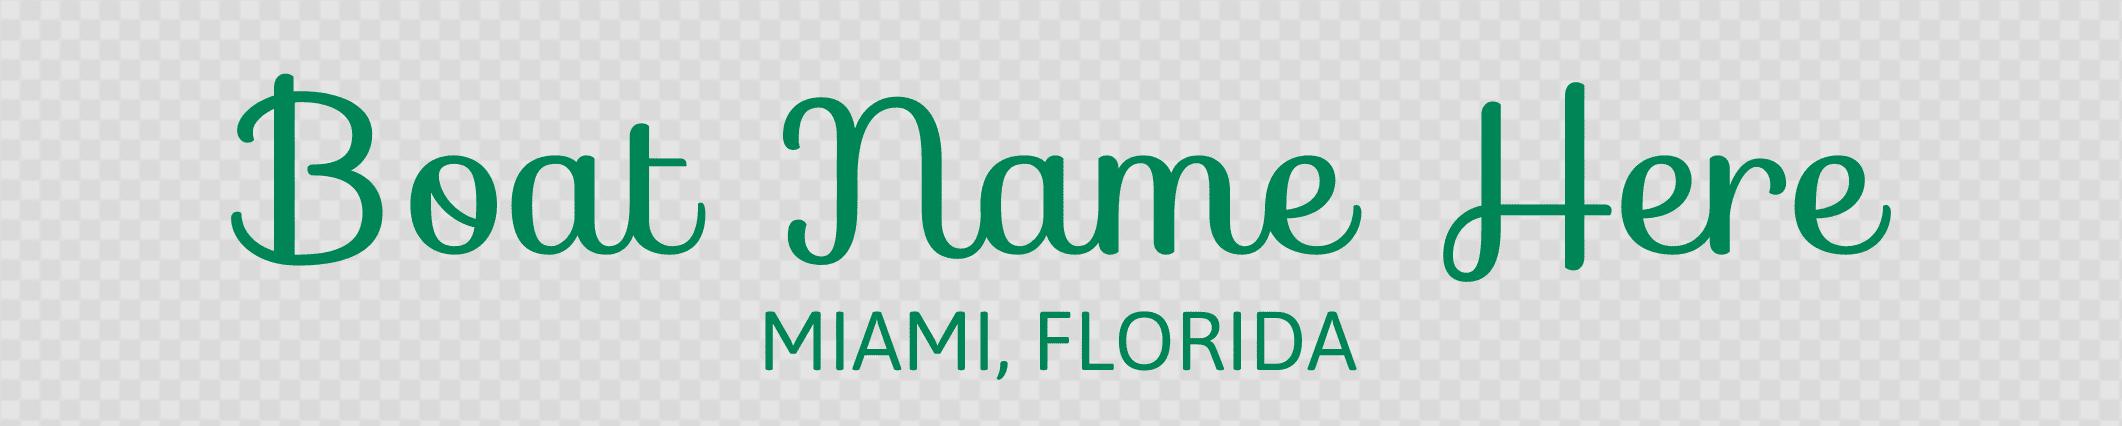 Florida hailing port